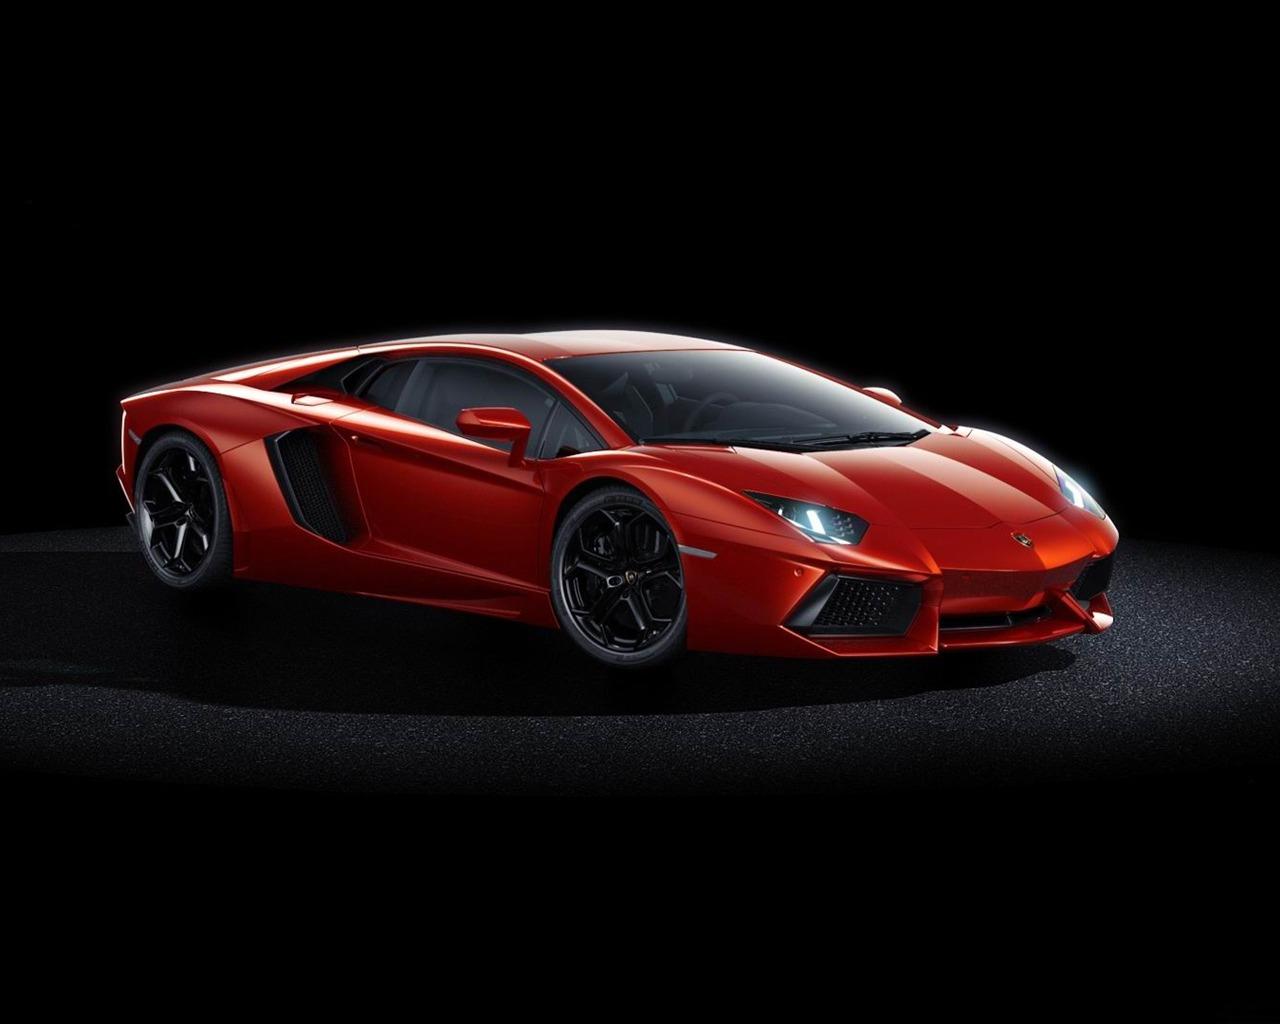 Lamborghini Aventador Lp700 2012 Luxury Car Hd Wallpaper